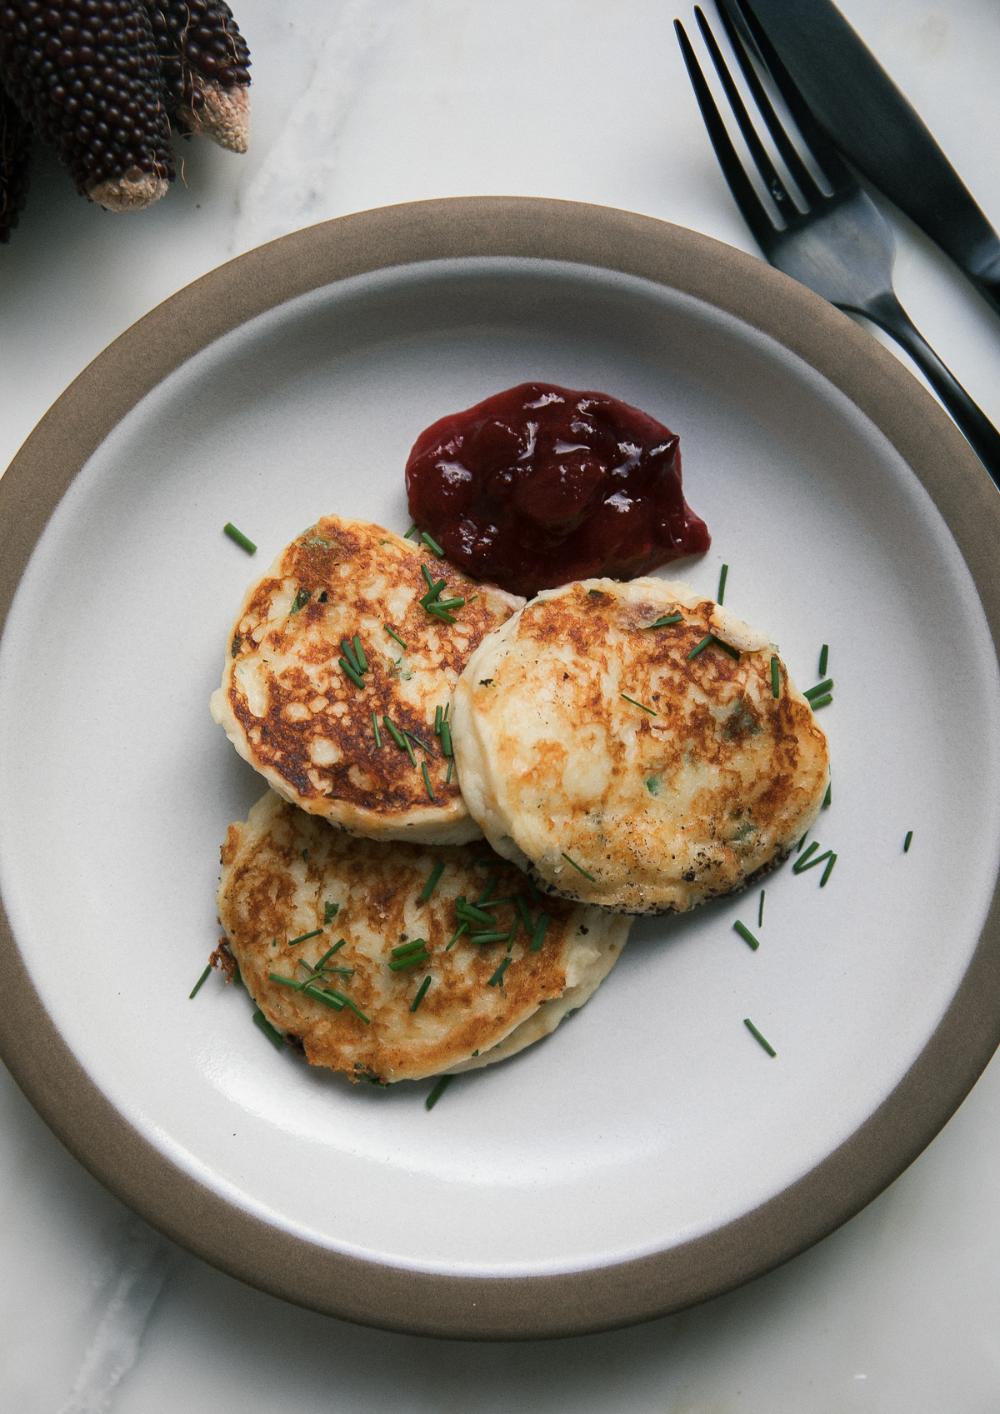 Leftovers Made Easy: Mashed Potato Pancakes | Fresh Tastes | PBS Food #potatopancakesfrommashedpotatoes Leftovers Made Easy: Mashed Potato Pancakes | Fresh Tastes | PBS Food #potatopancakesfrommashedpotatoes